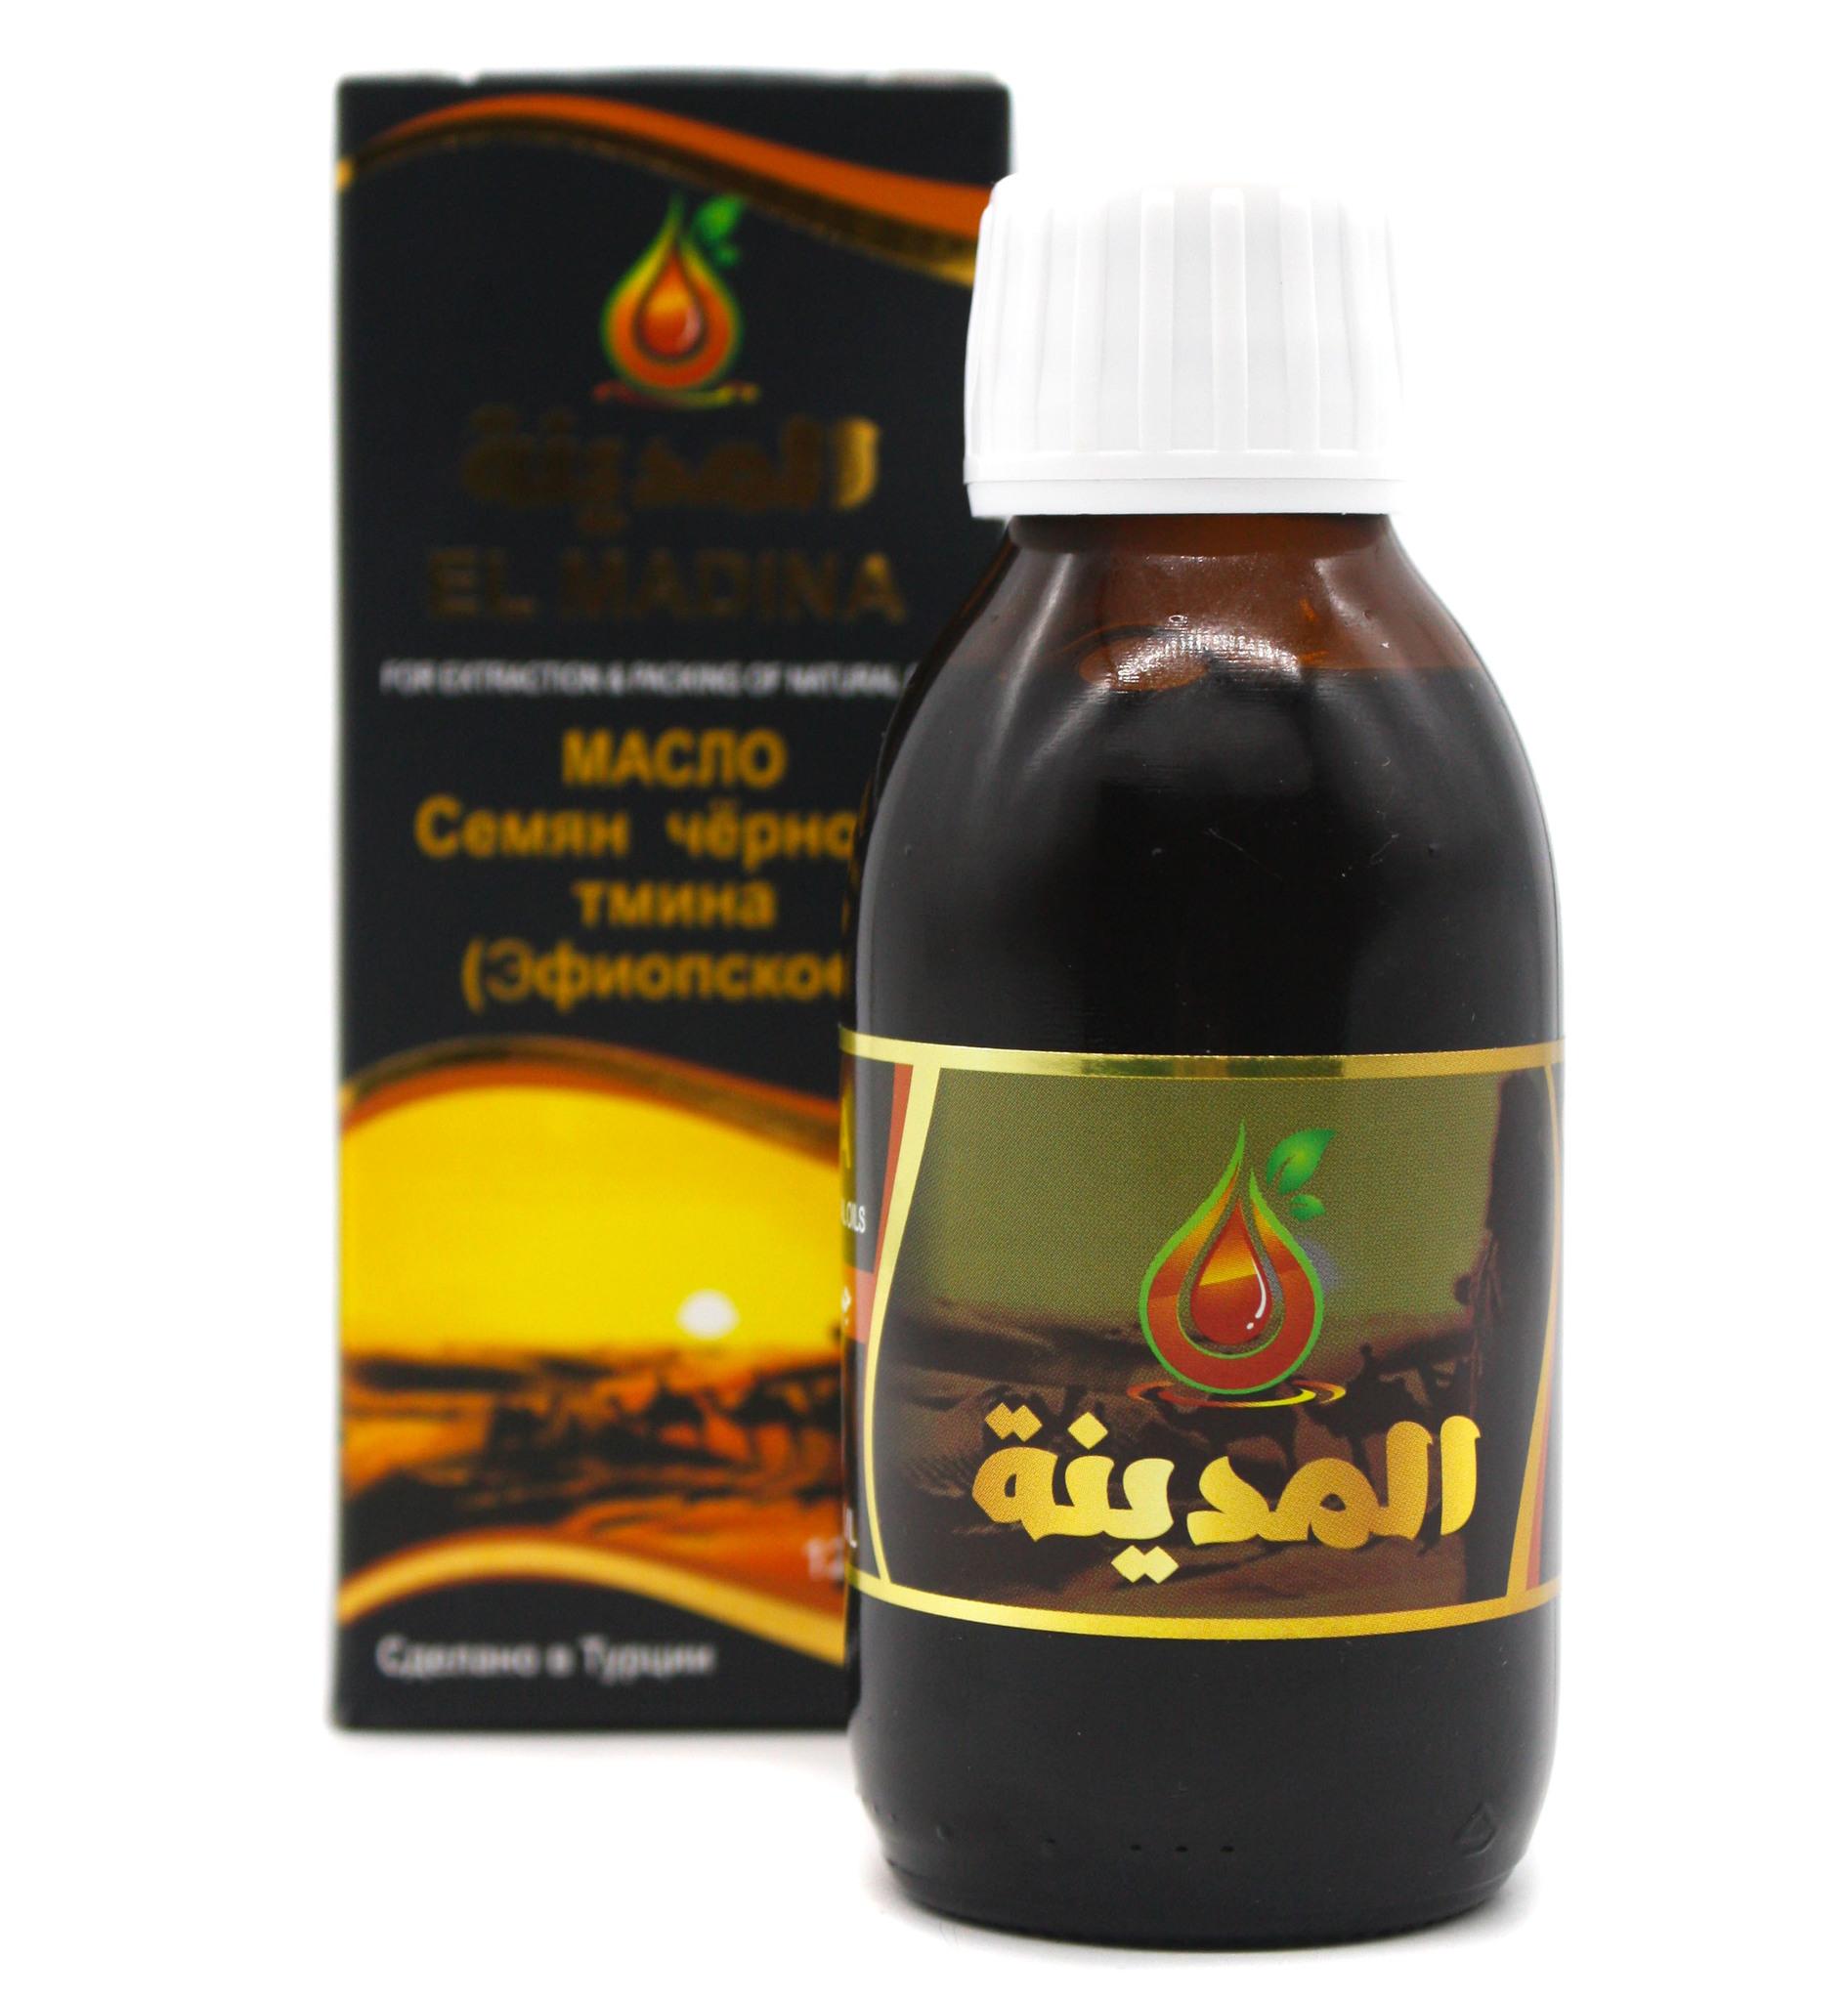 Масло черного тмина Масло семян черного тмина Эфиопское El Madina, 125 мл import_files_53_5349bc86eefb11e8a9a1484d7ecee297_37c2e522f6cb11e8a9a1484d7ecee297.jpg